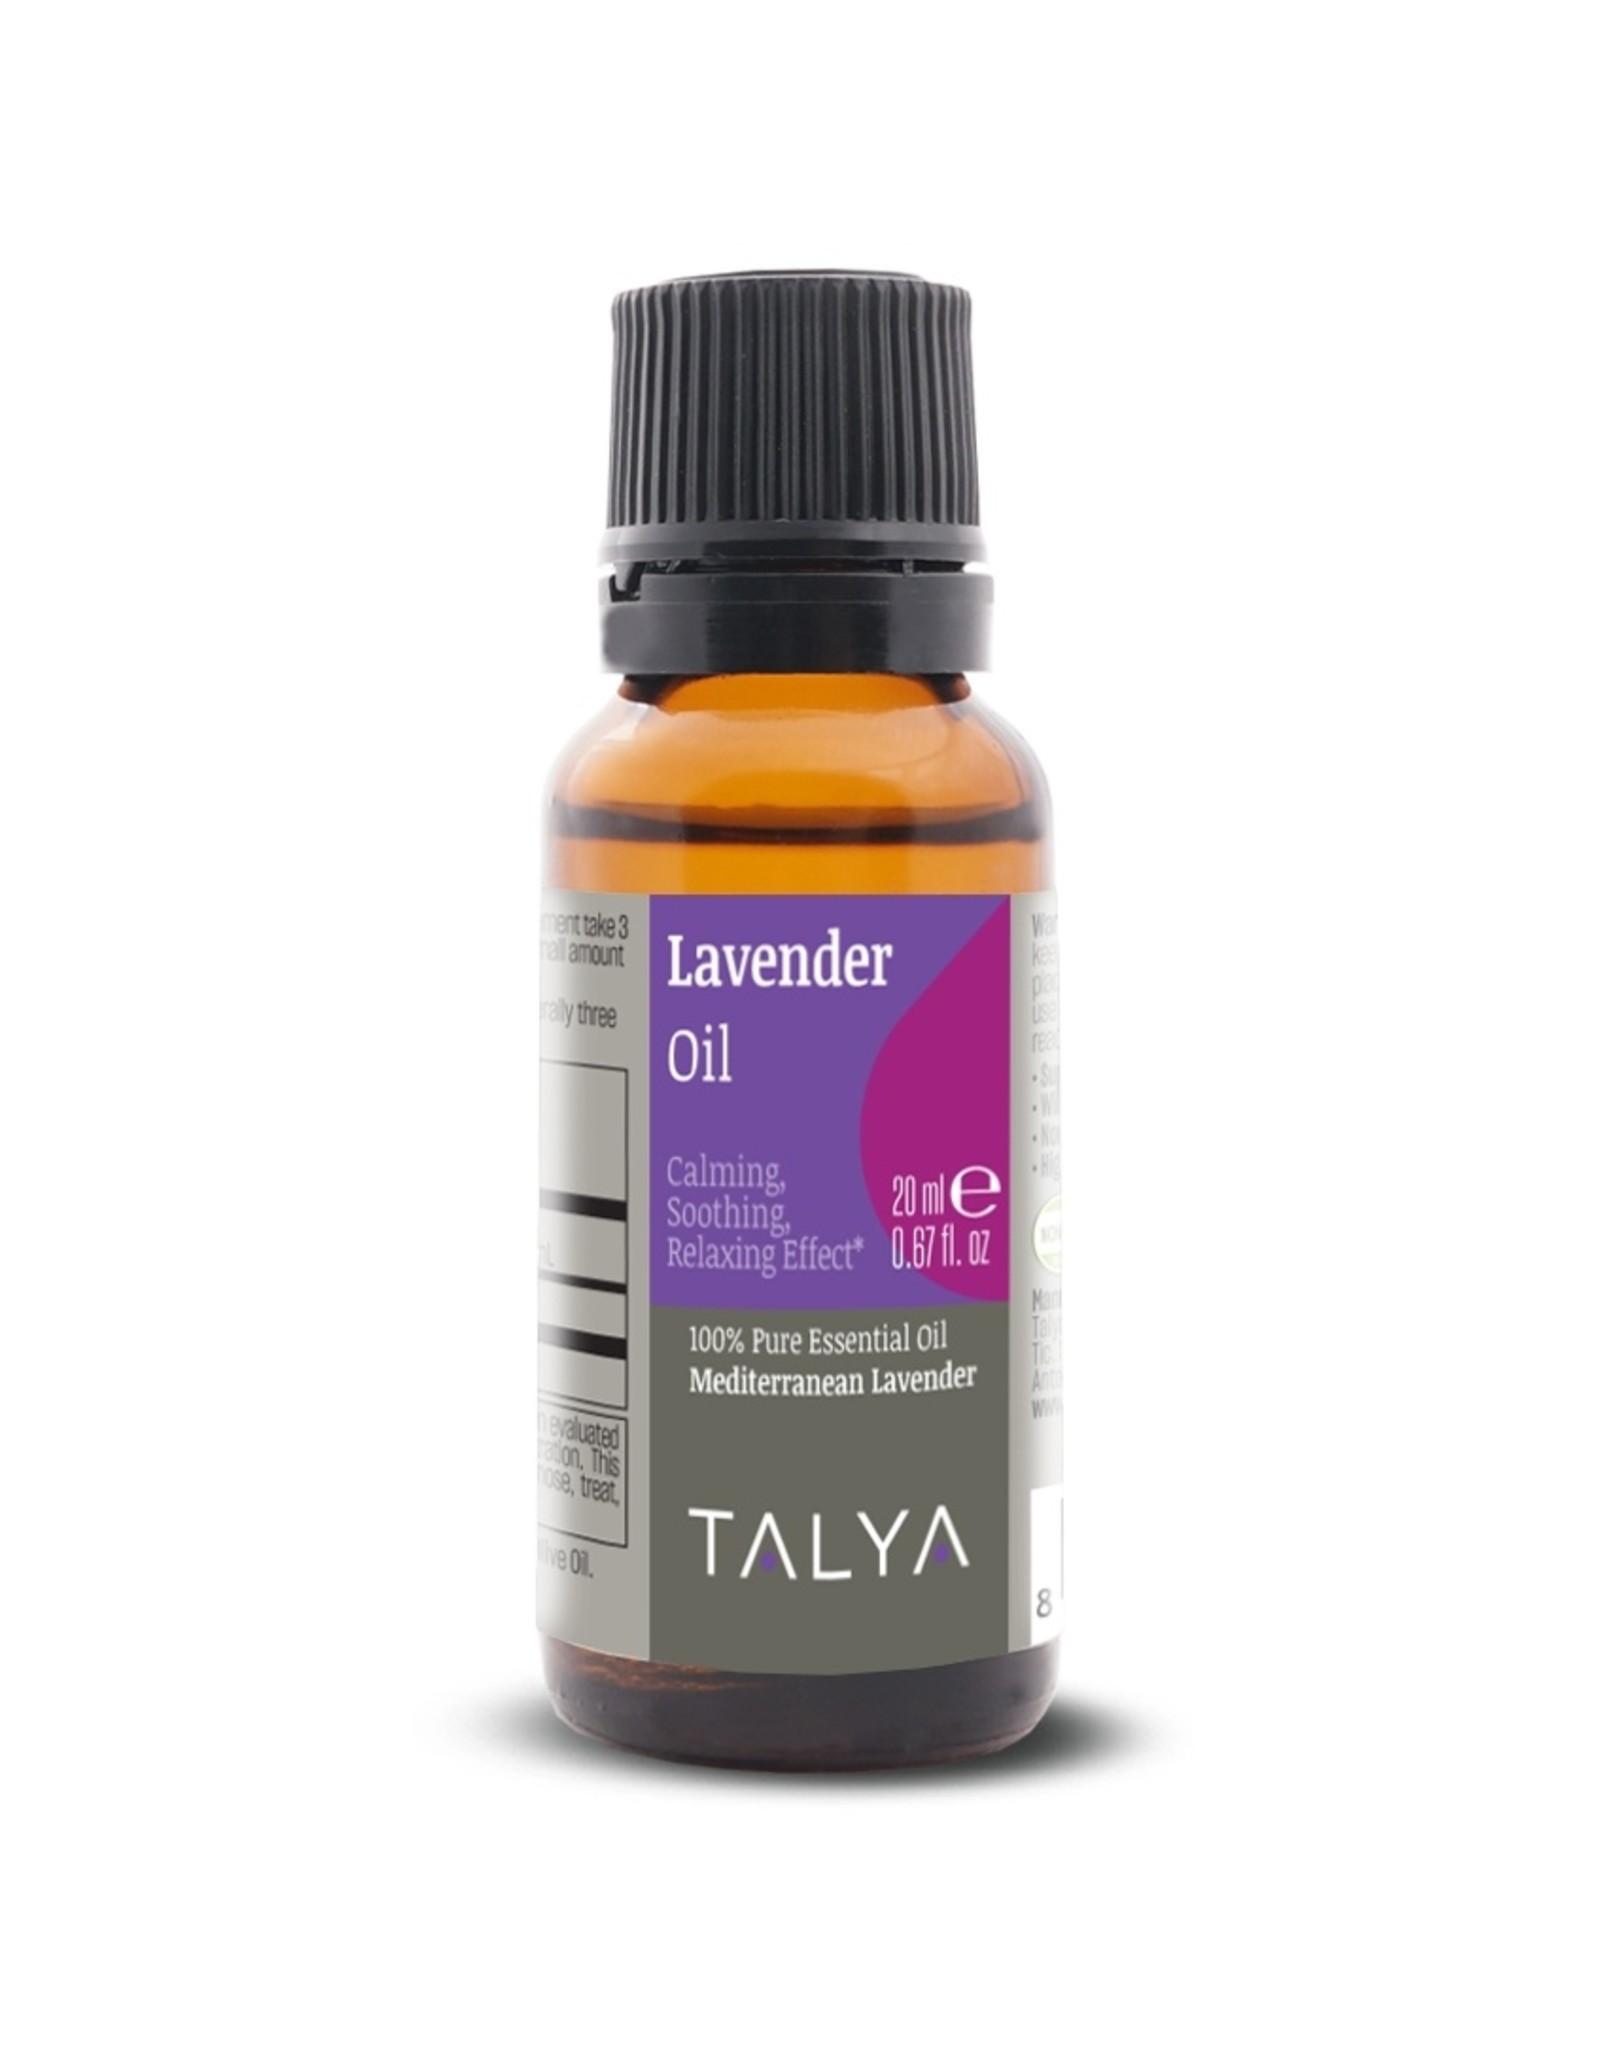 TALYA  Talya Lavendel olie 100% natuurlijke pure etherische olie 20 ml